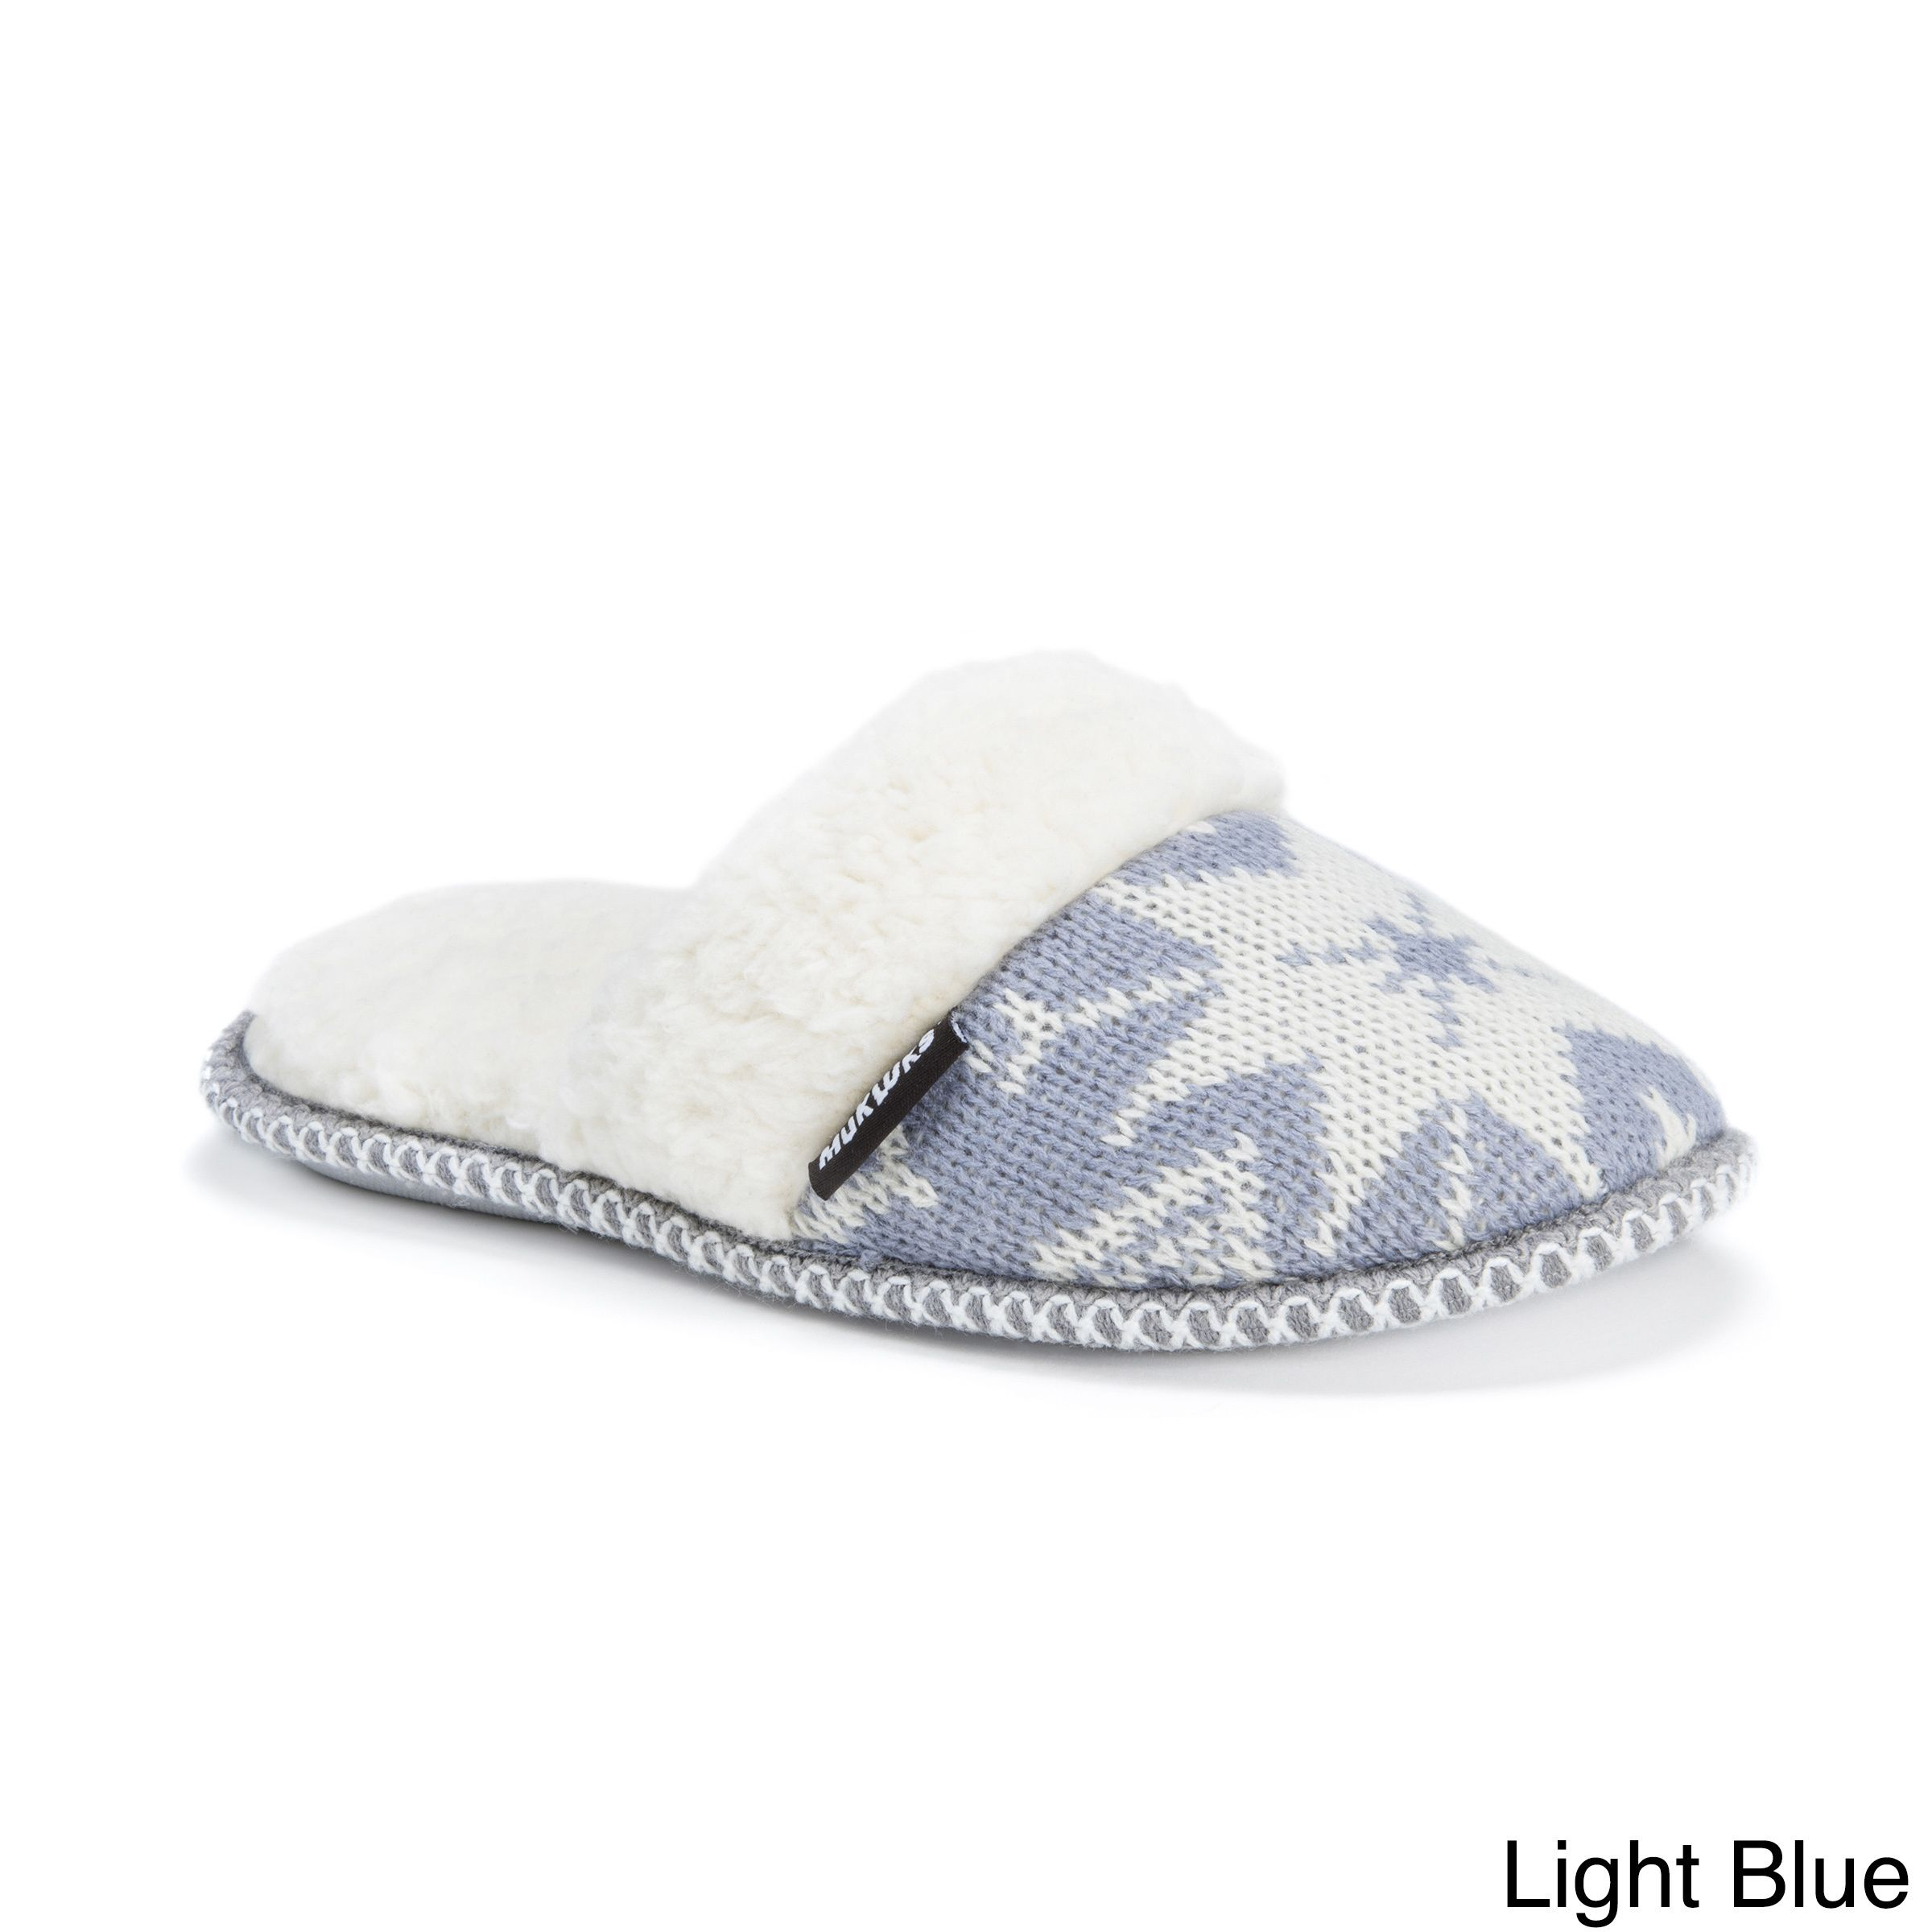 Women's Muk Luks Fair Isle Knit Scuff Slide Slippers - Light Blue S